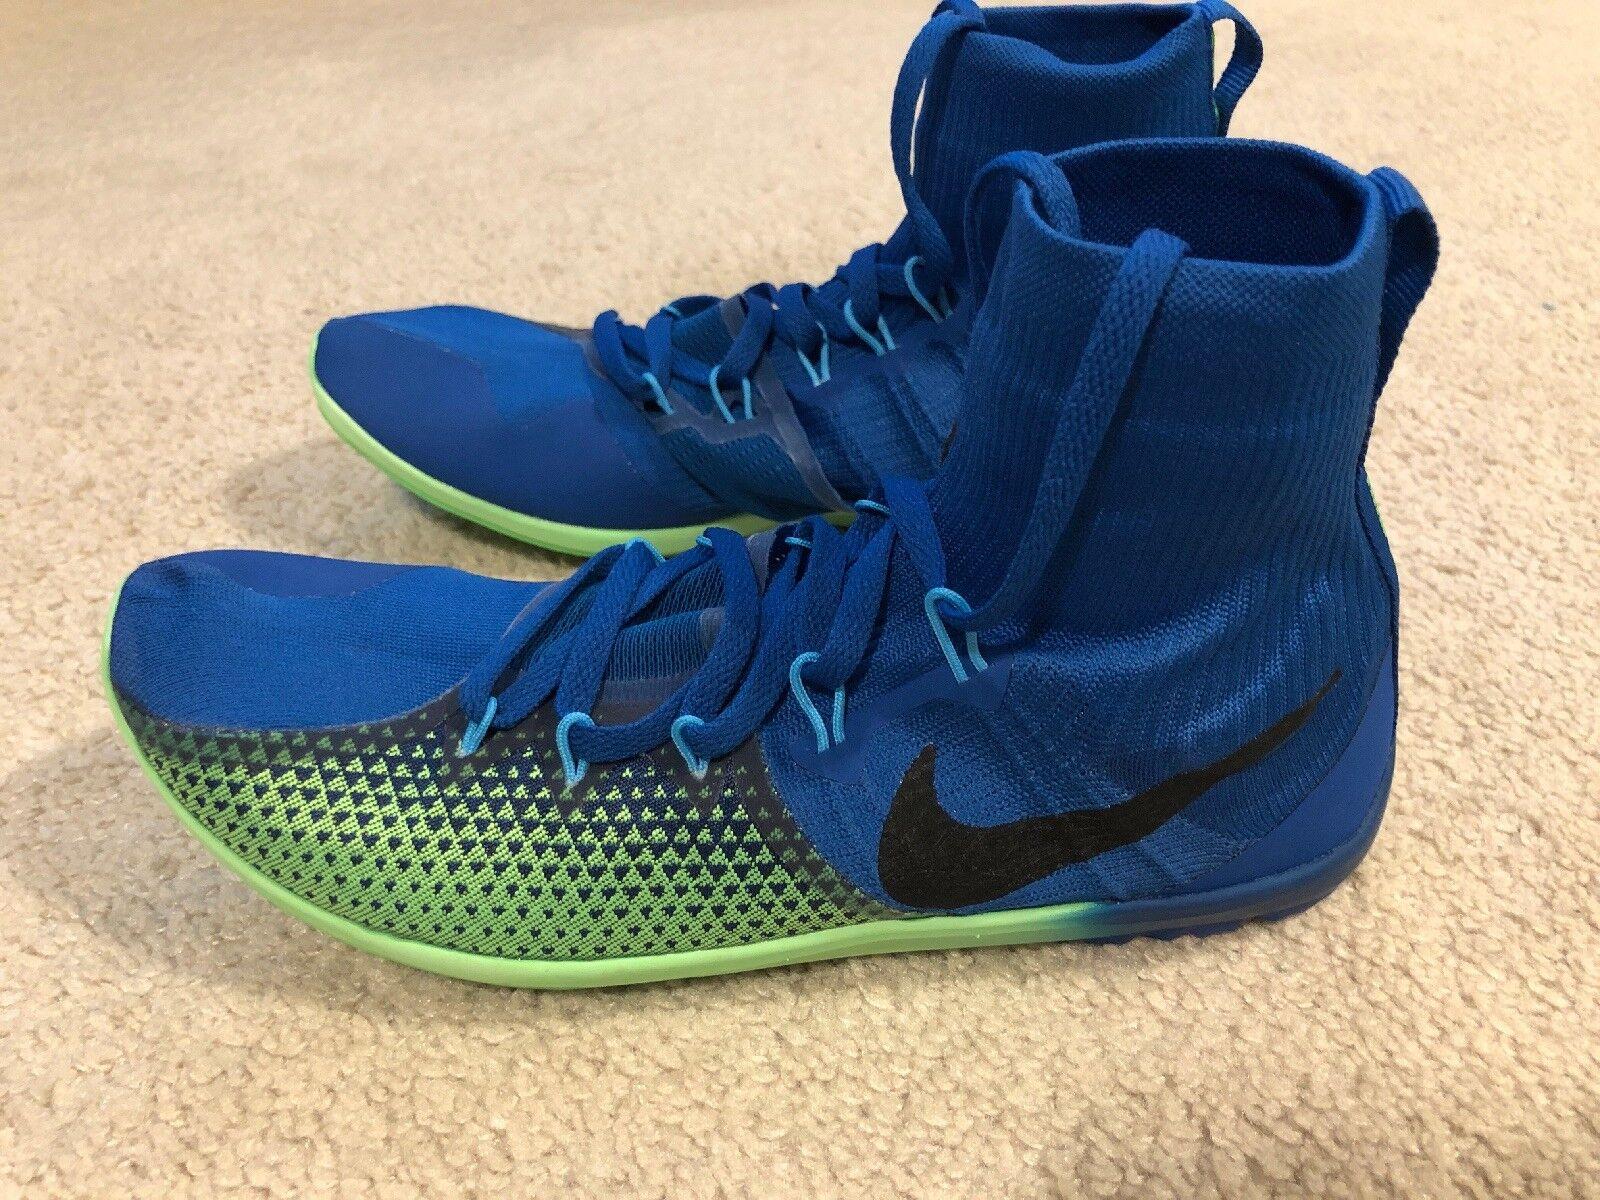 NWOB Nike Zoom Victory XC 4 Track Cross Country Spike Men's 10 bluee Green